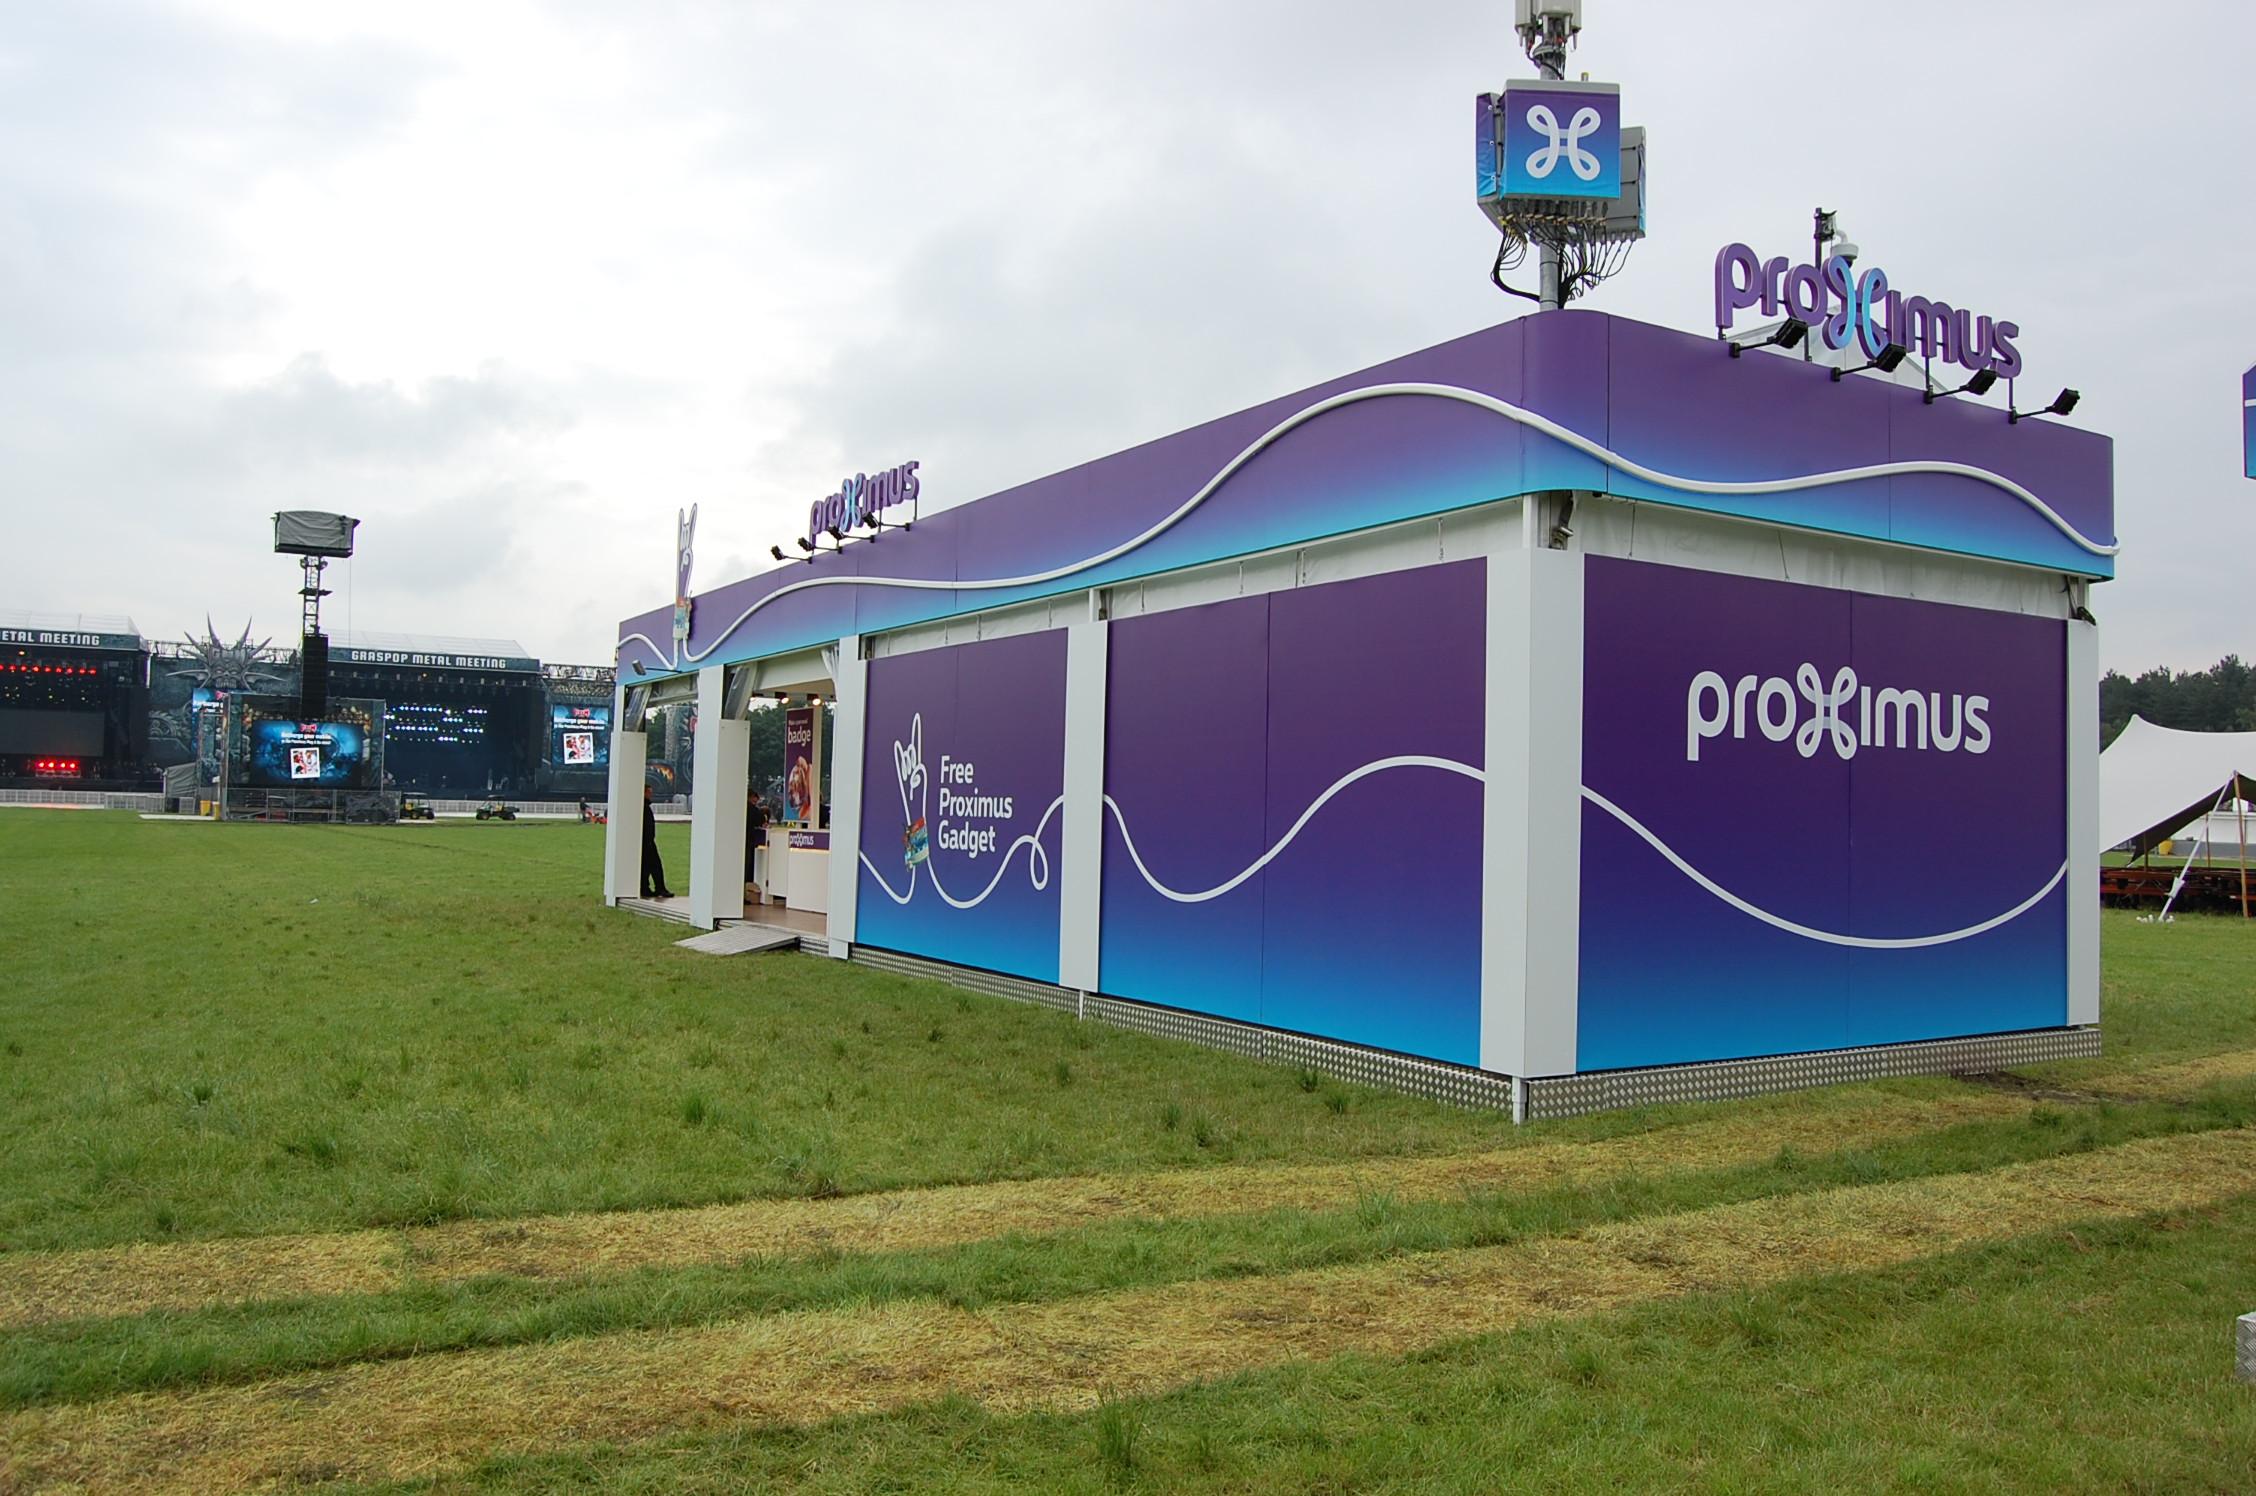 Festivalstand - Proximus